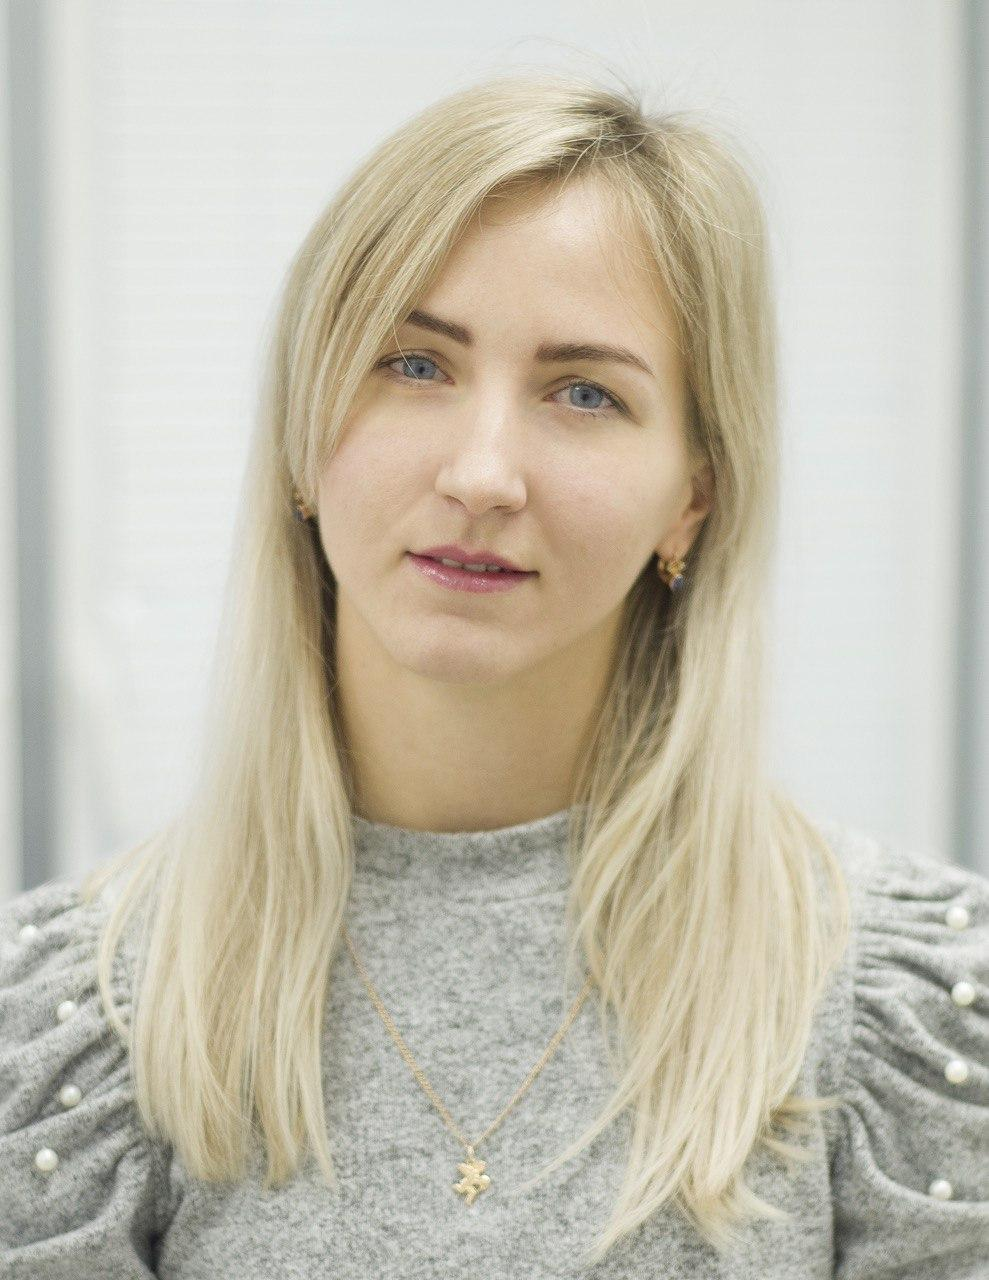 Алехина Анастасия Алексеевна